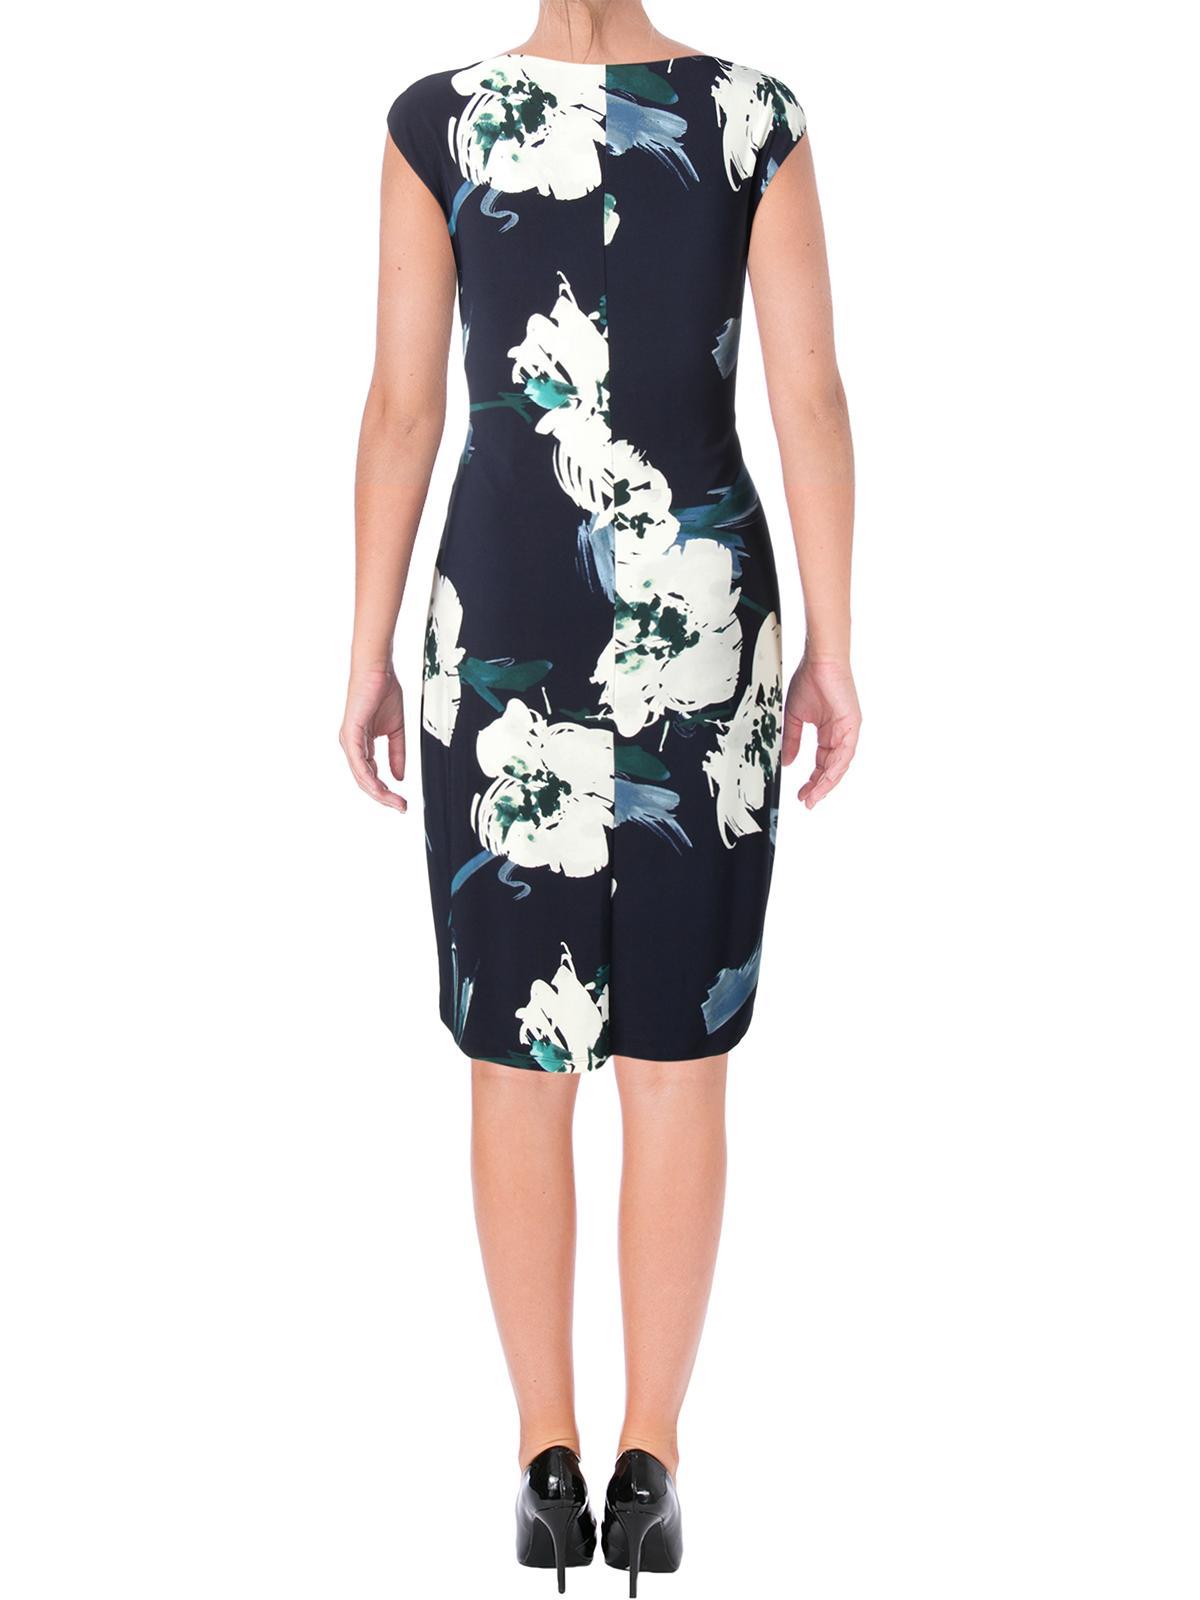 4a5e86f33e7 Lauren Ralph Lauren - Lauren Ralph Lauren Womens Valli Belvedere Floral Cowl  Neck Wear to Work Dress - Walmart.com